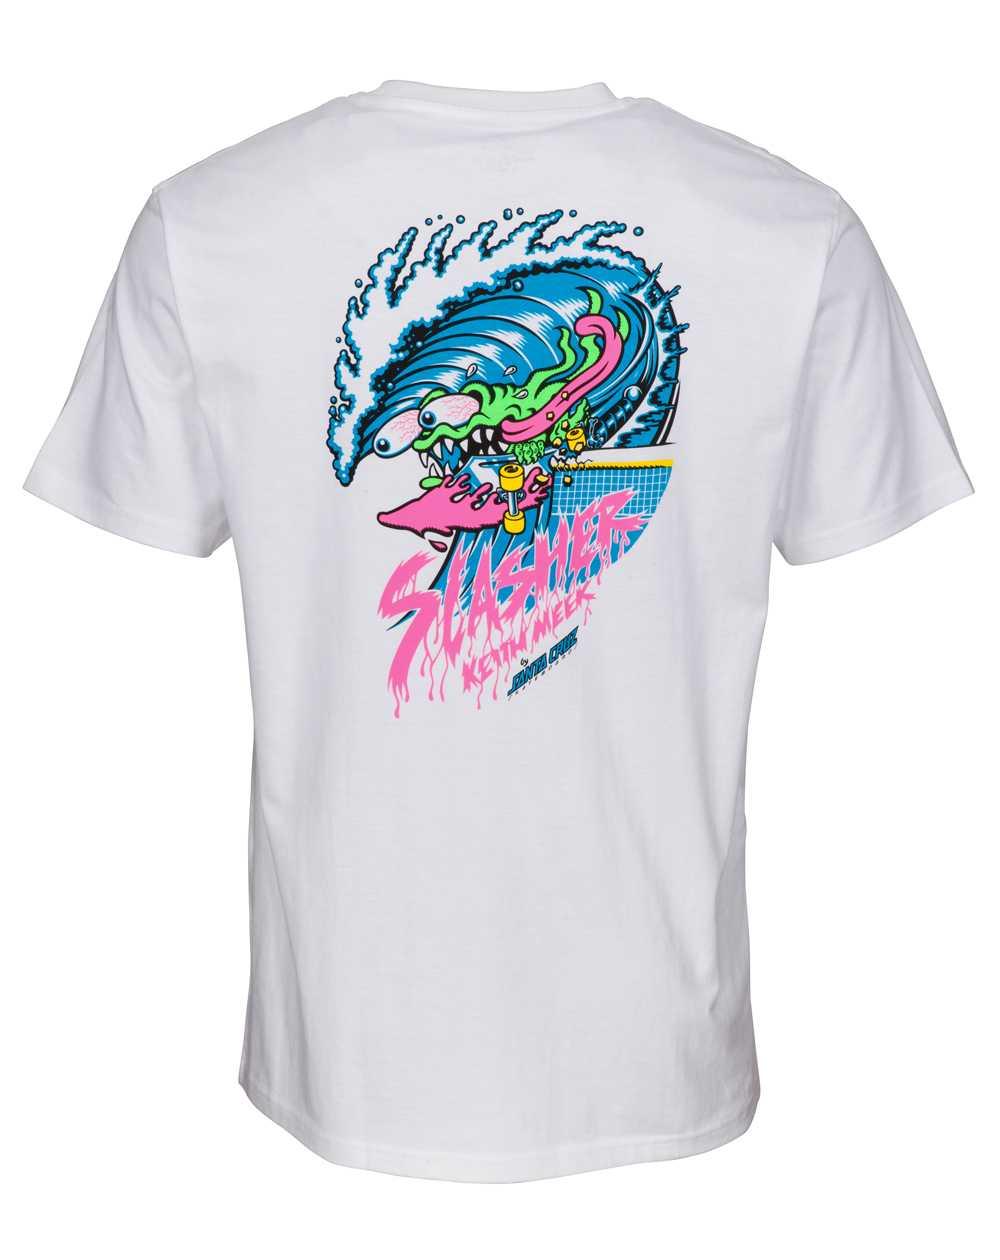 Santa Cruz Herren T-Shirt Wave Slasher White